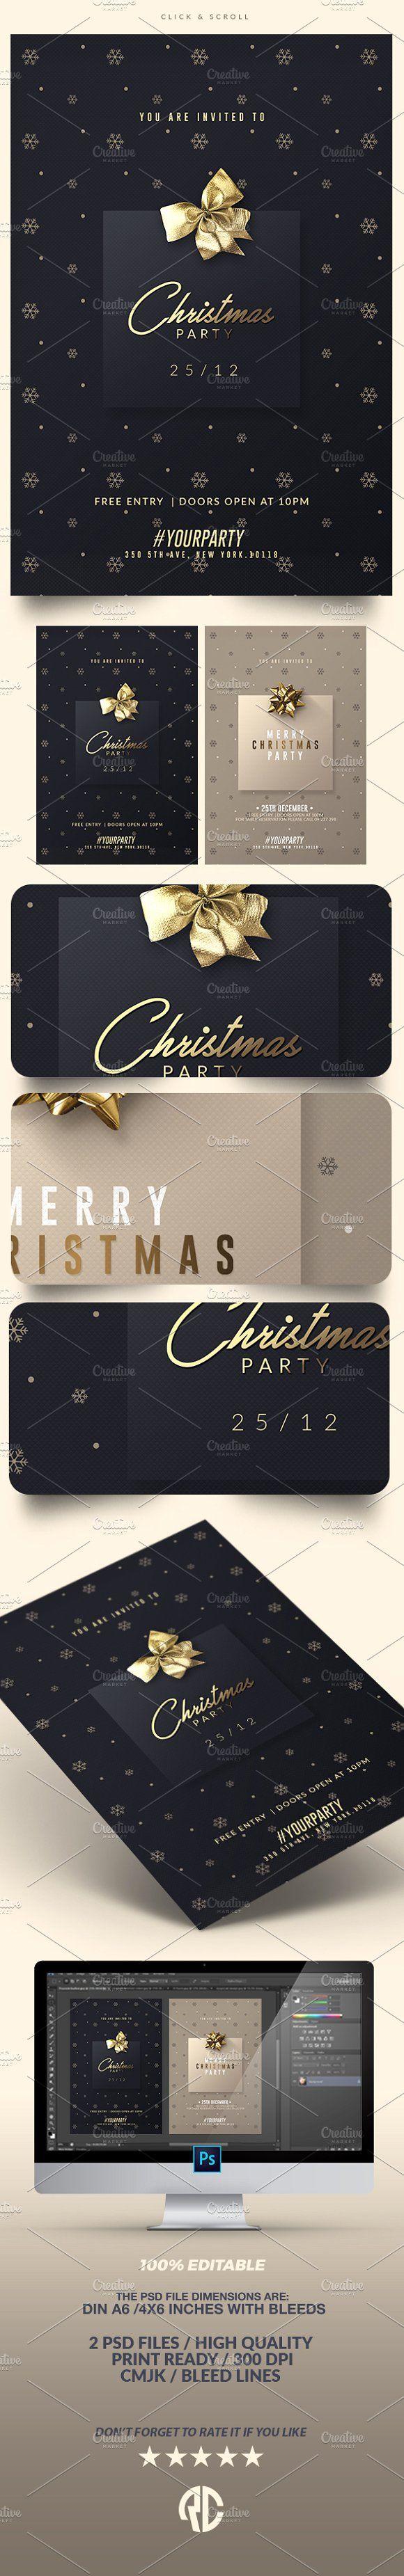 2 Classy Christmas | Psd Invitations - Invitations